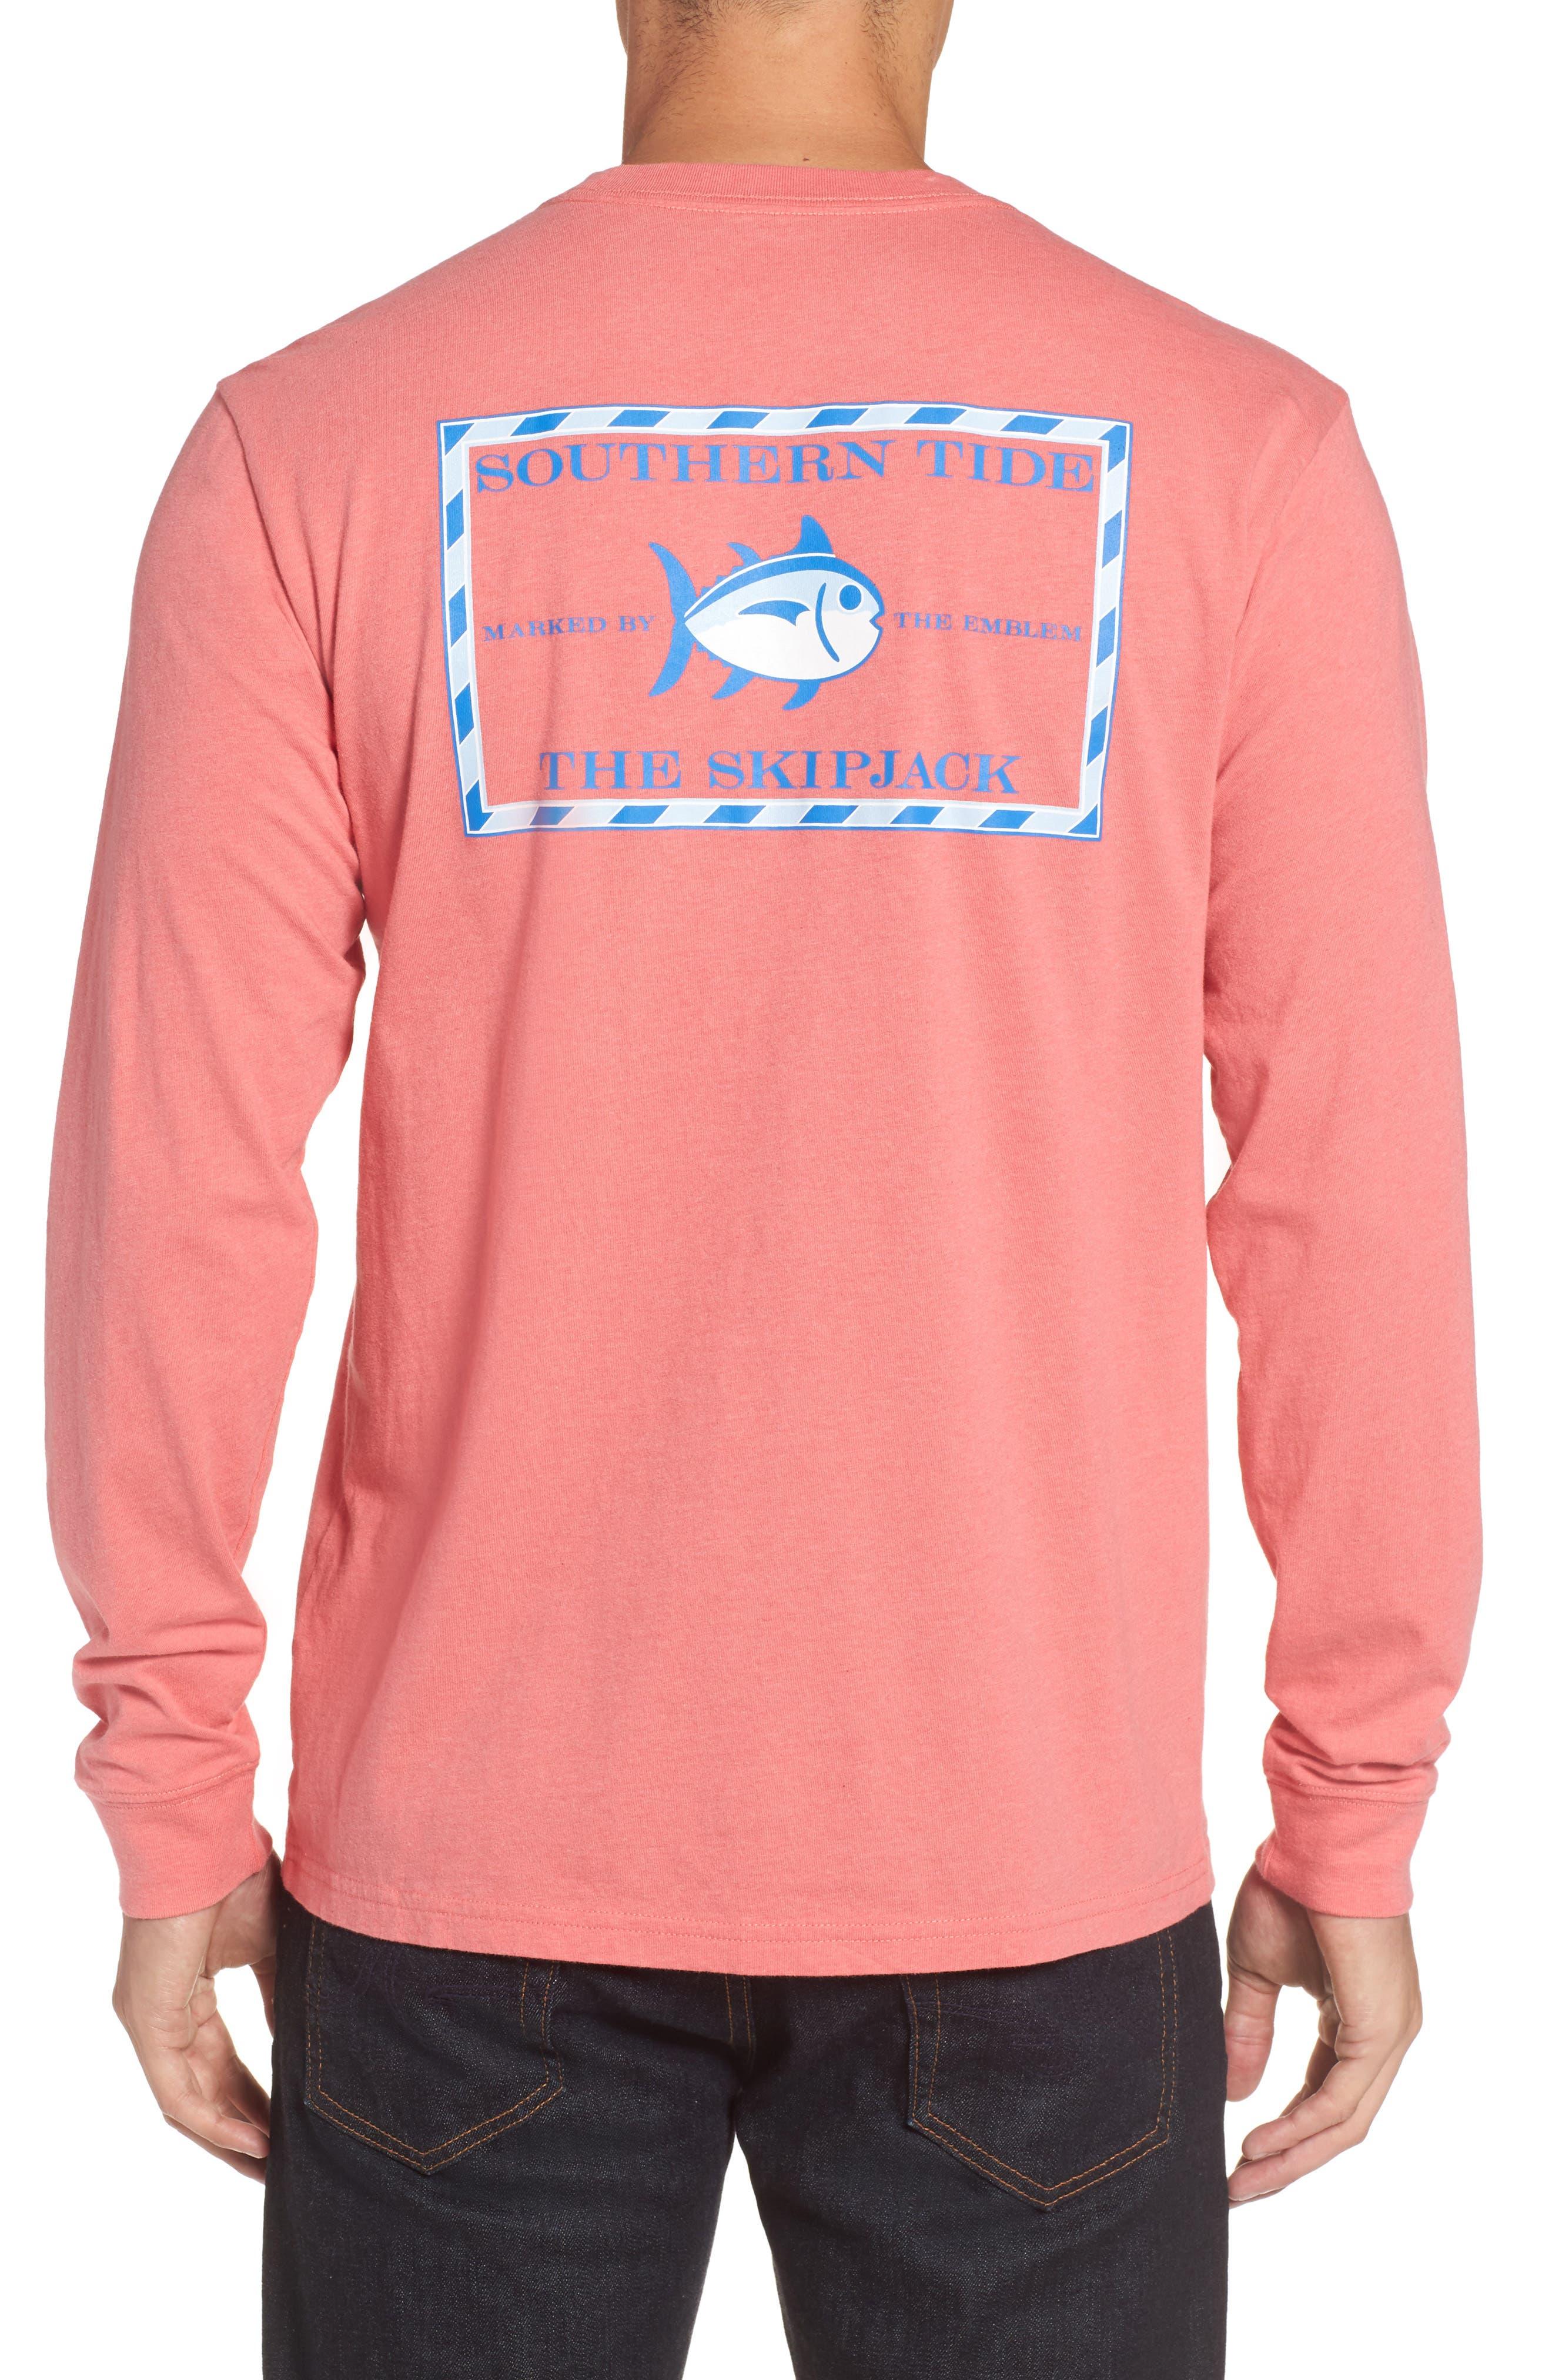 Main Image - Southern Tide Original Skipjack T-Shirt